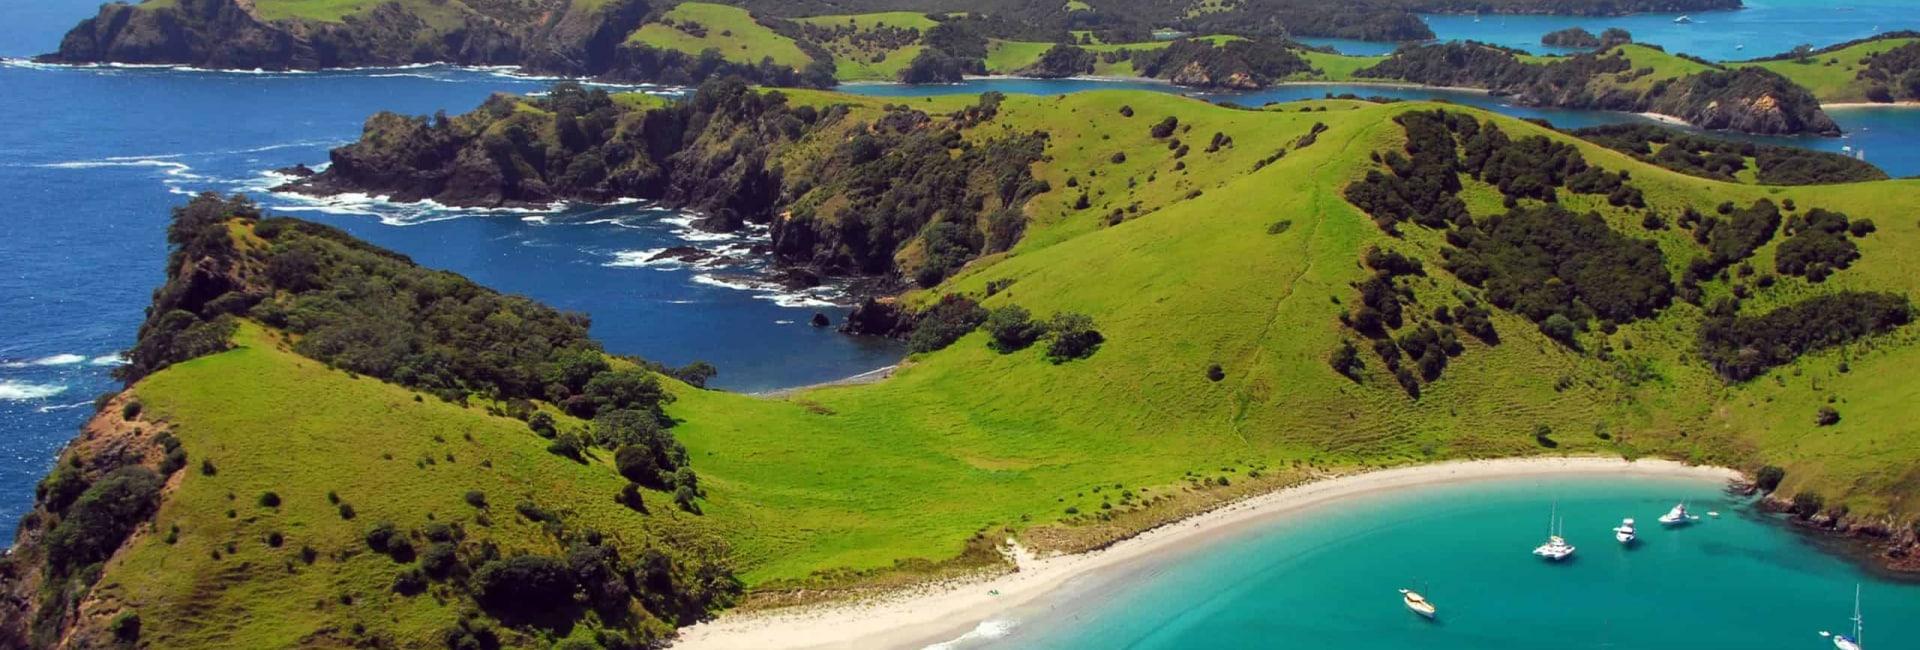 Bay of Islands i New Zealand